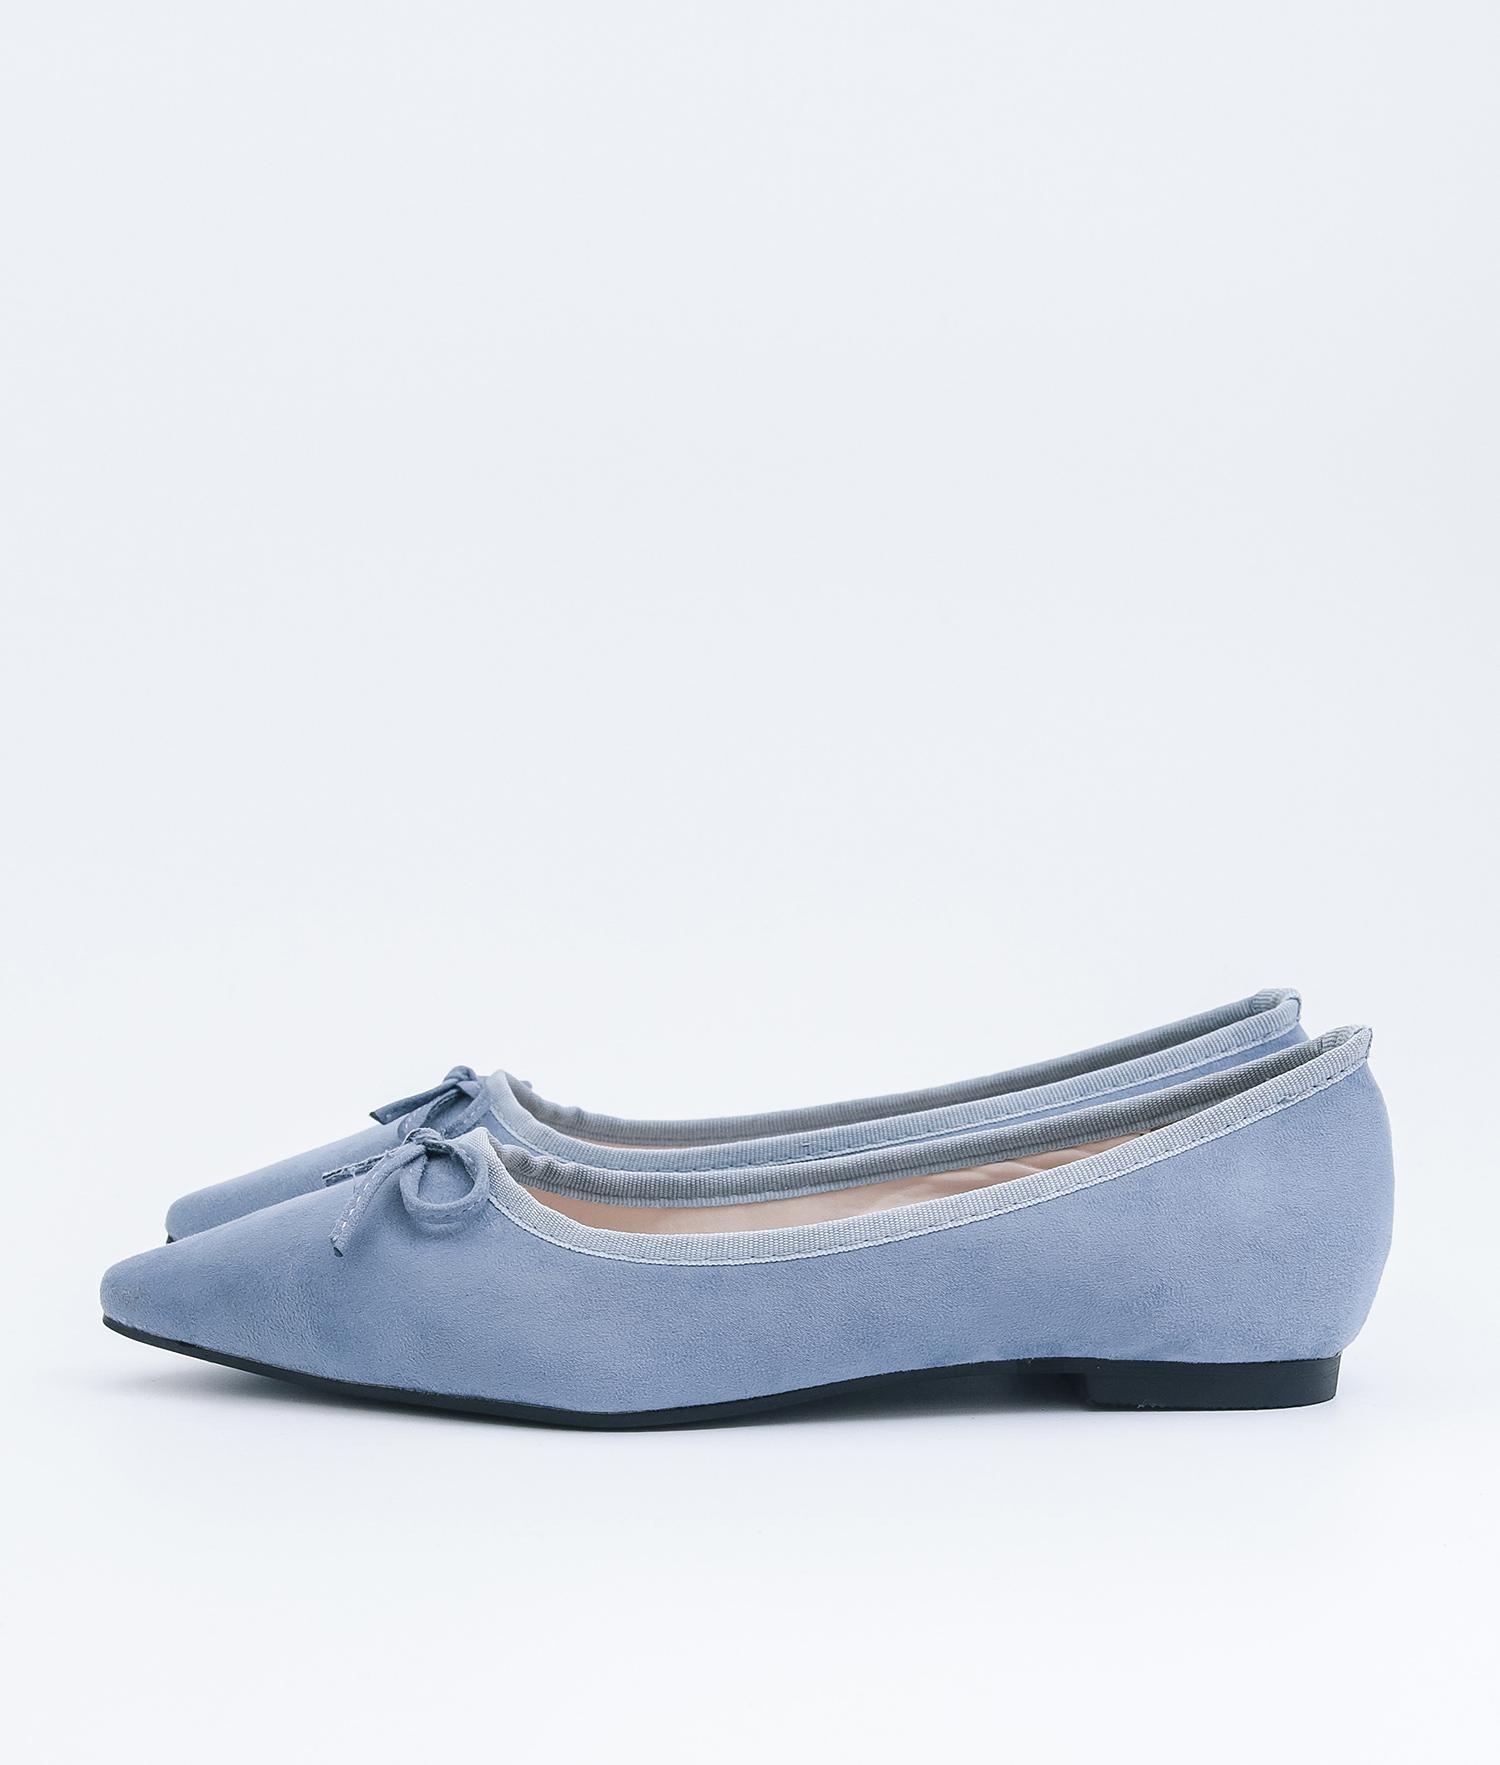 a7055c89015 AnnaKastle Womens Cute Bow Pointed Toe Ballerina Flats Blue